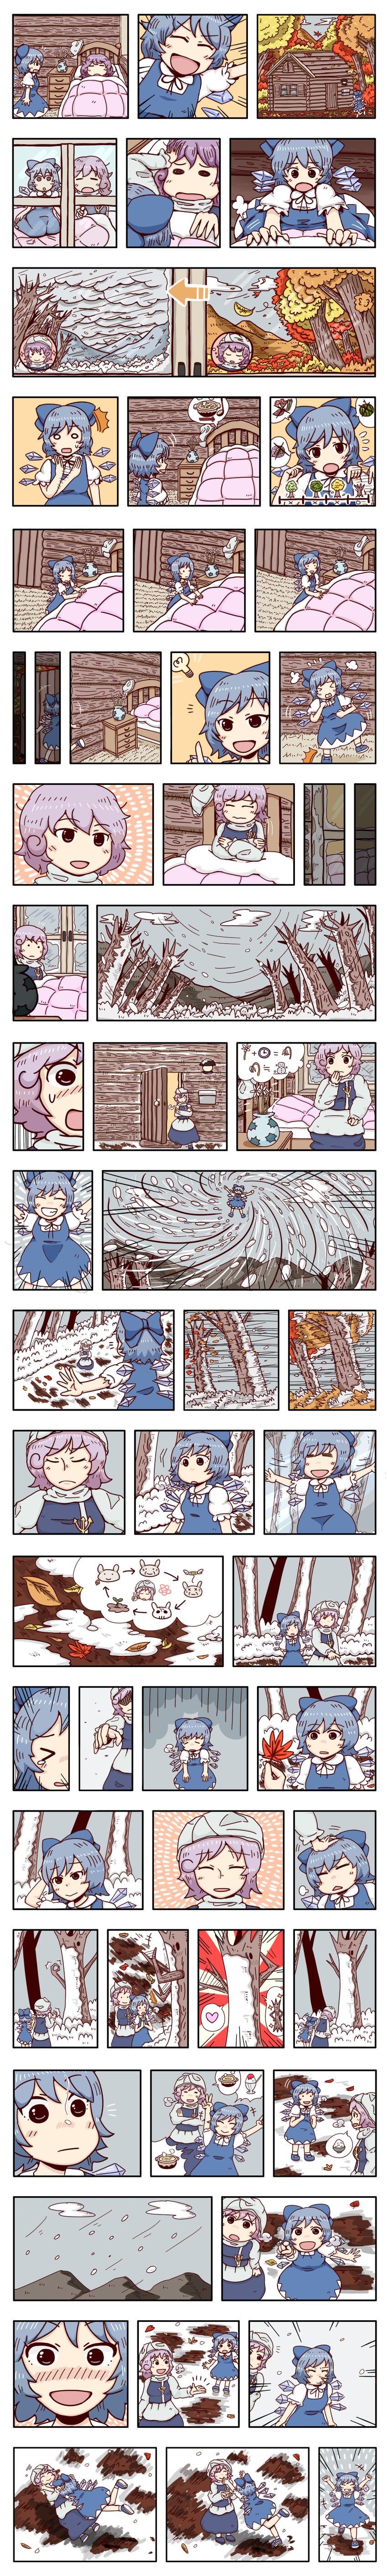 cirno and letty whiterock (touhou) drawn by jiru (jirufun)